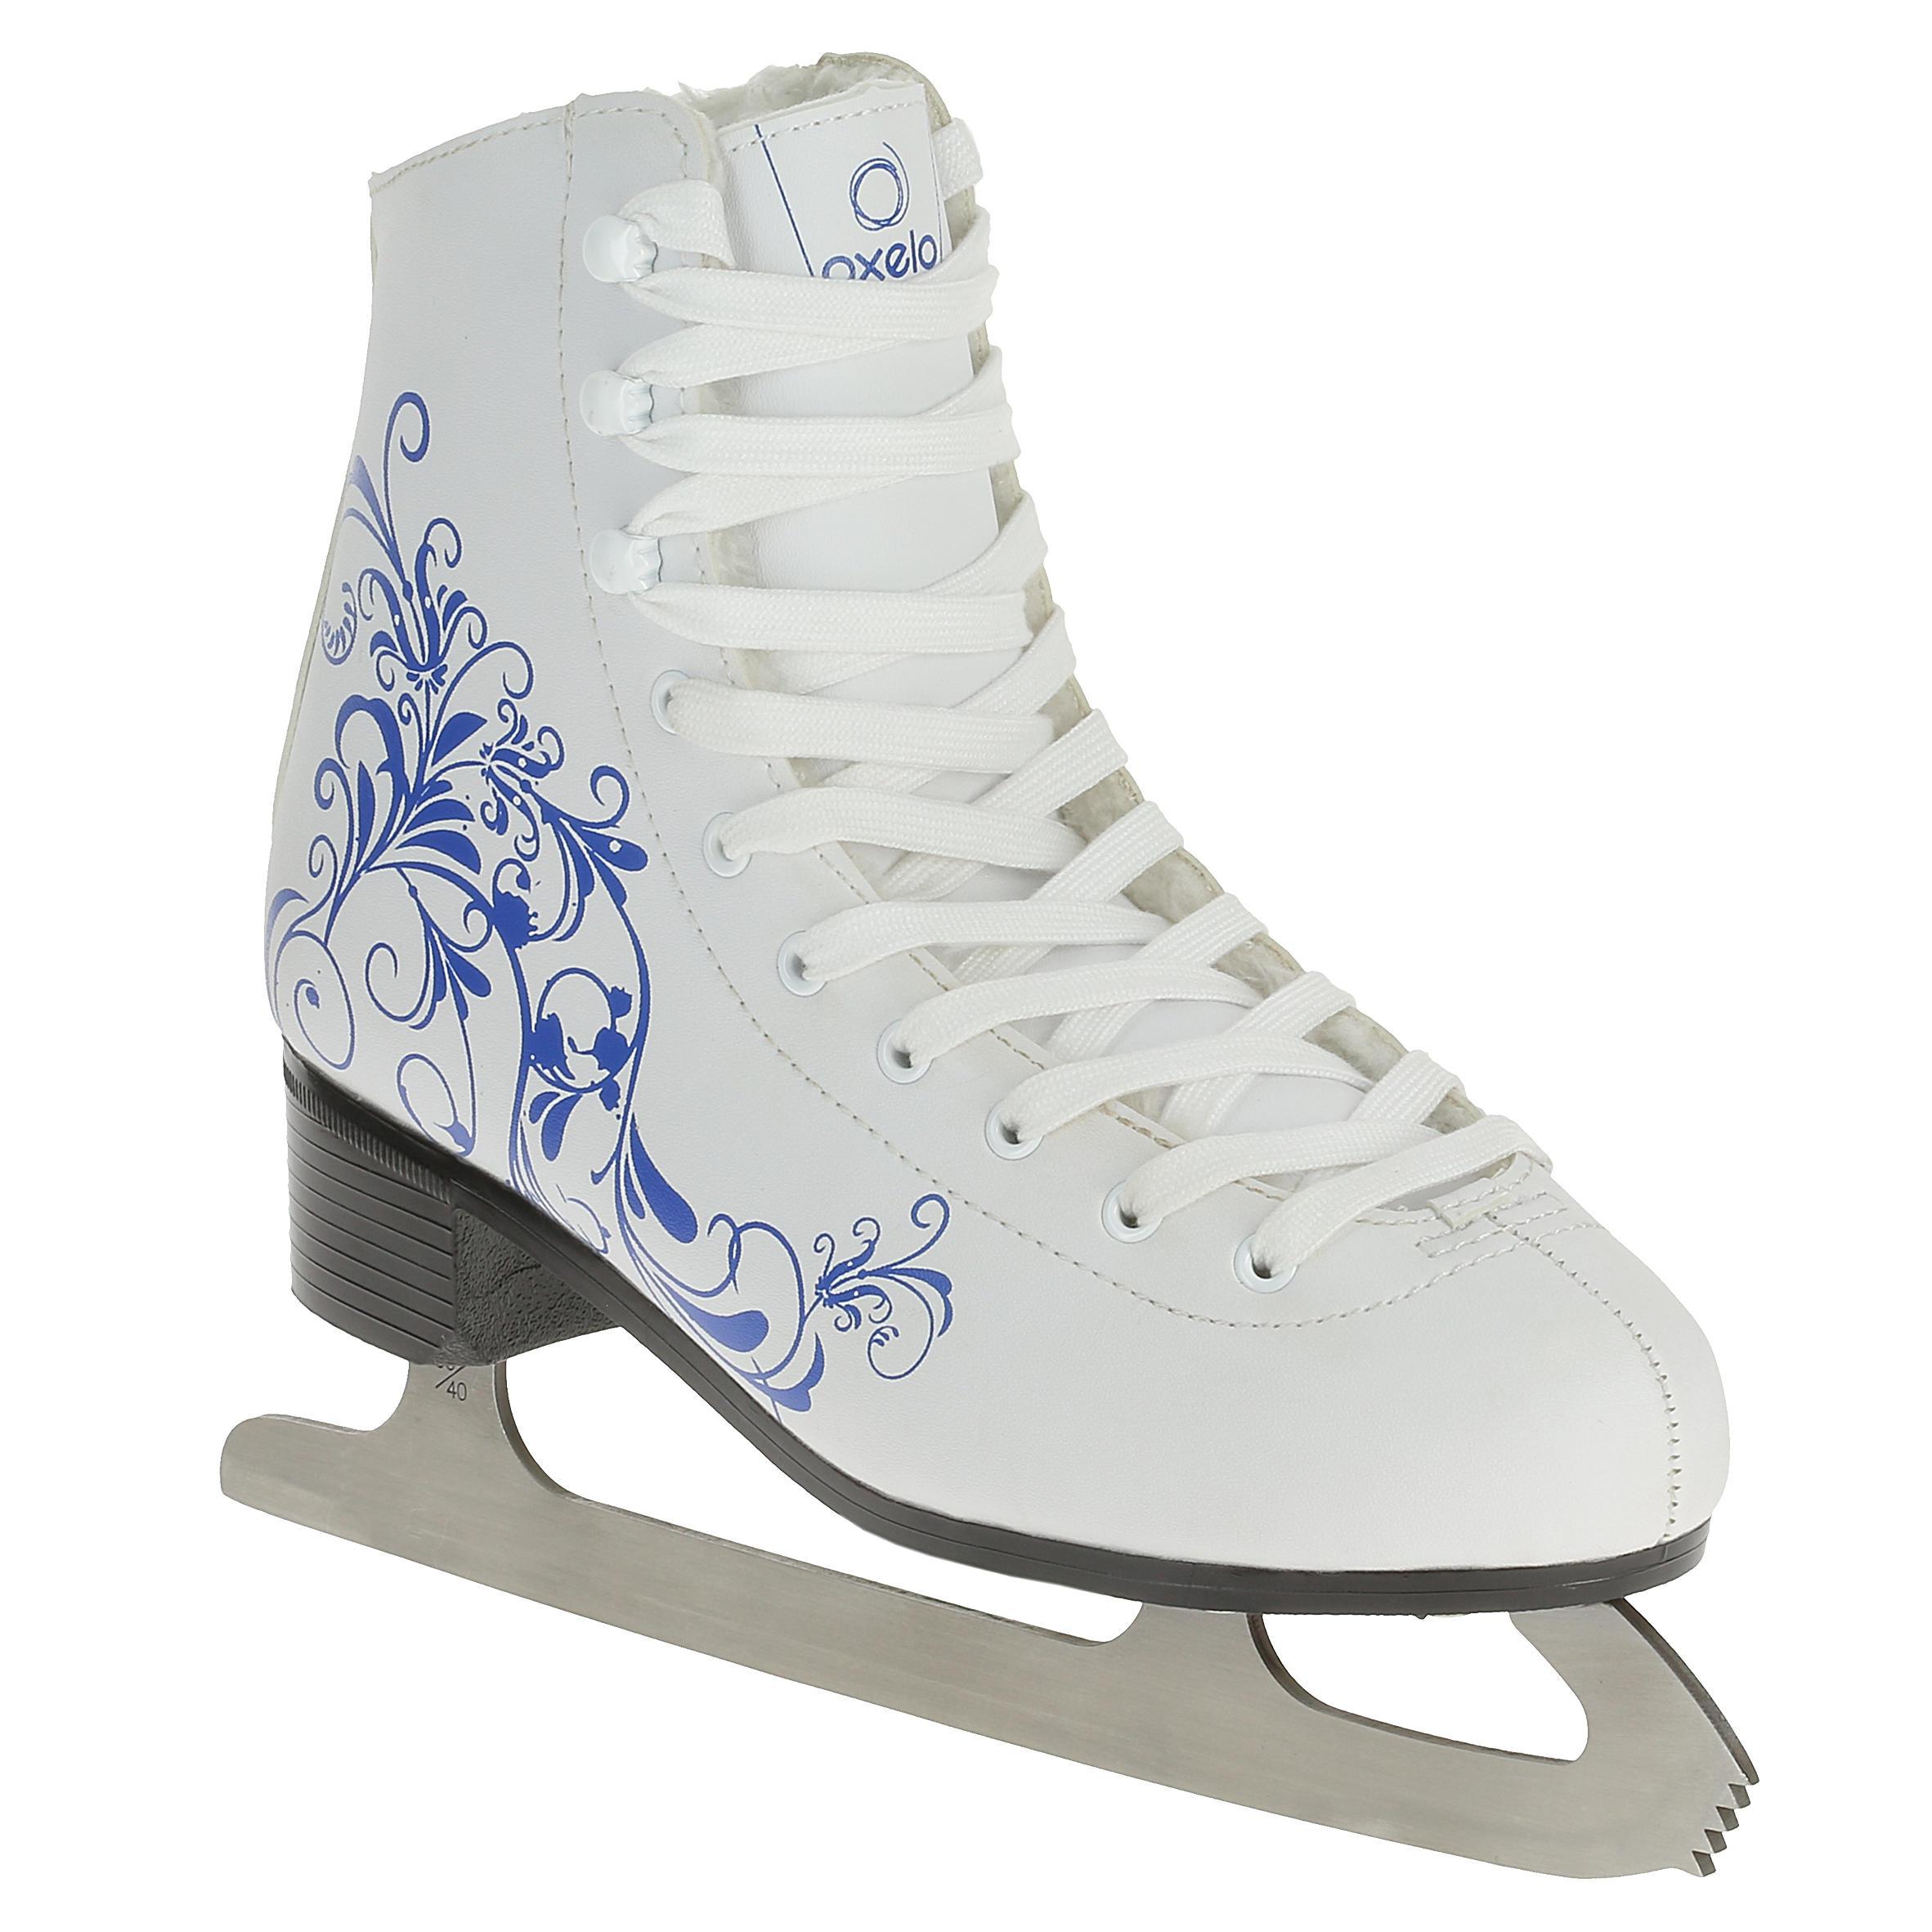 120 Warm Ice Skates